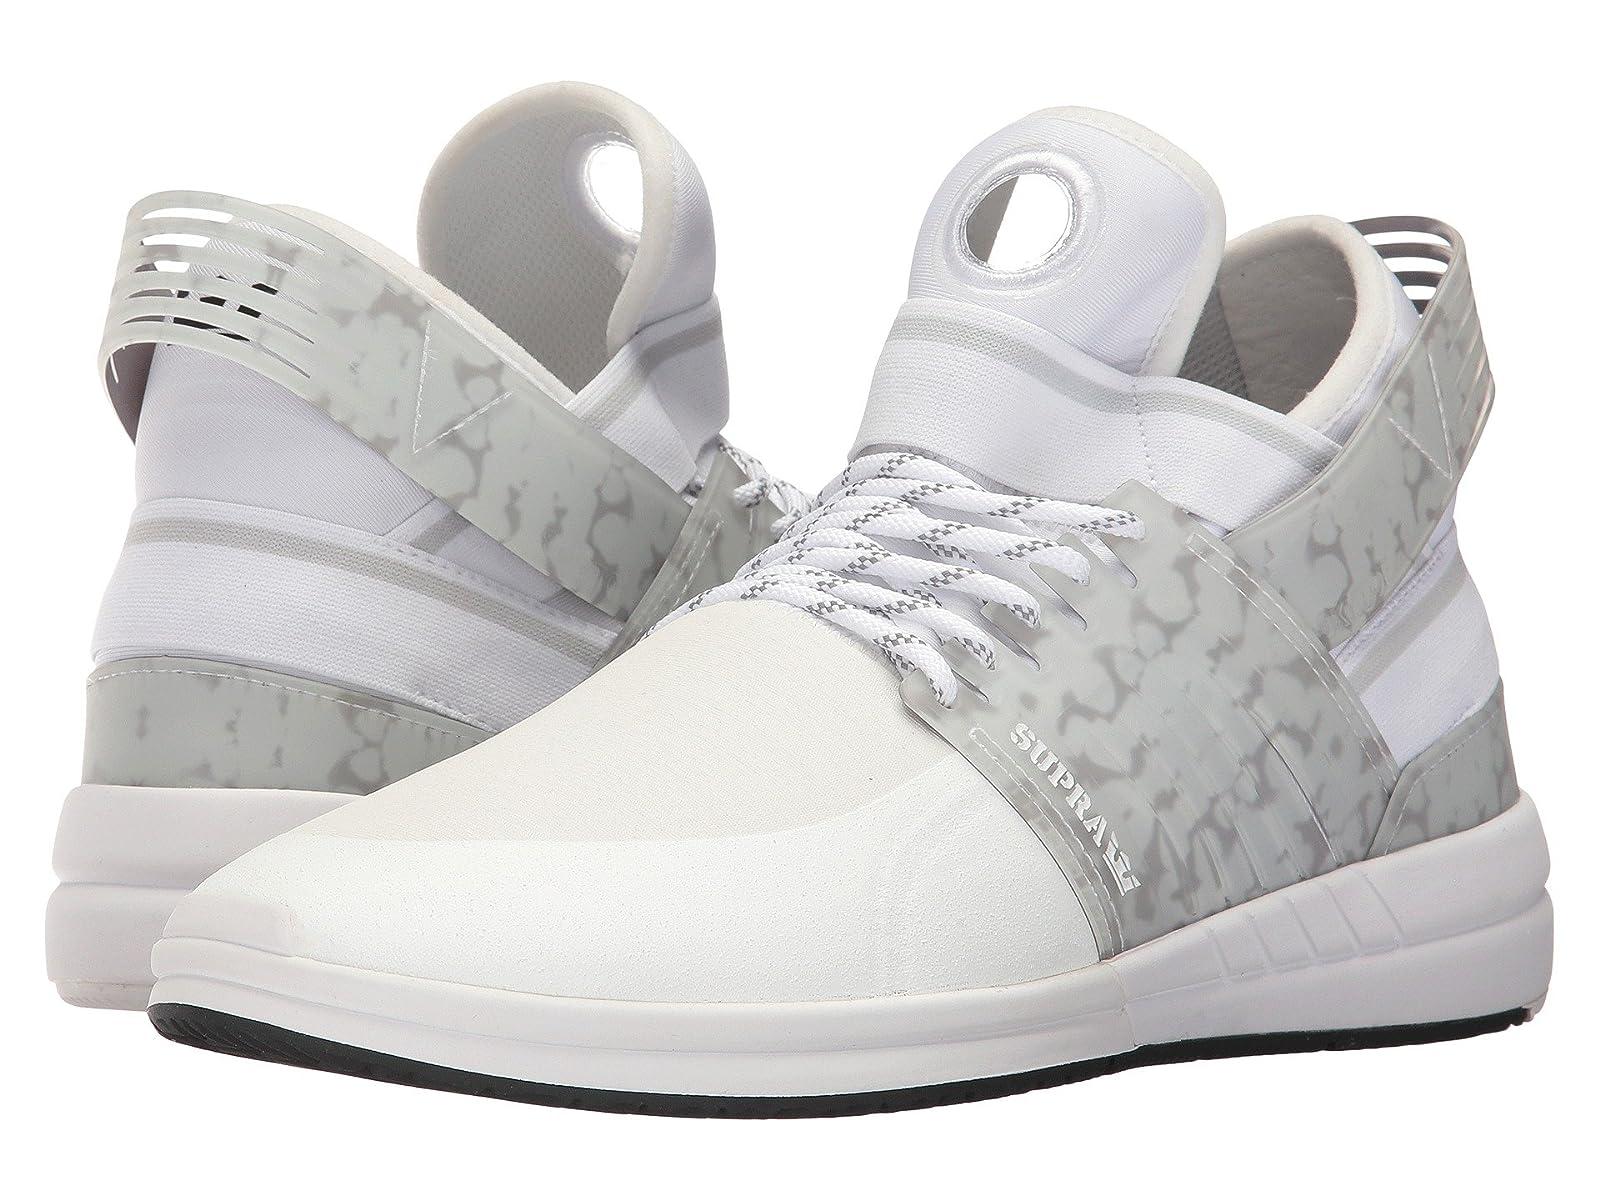 Supra Skytop VCheap and distinctive eye-catching shoes